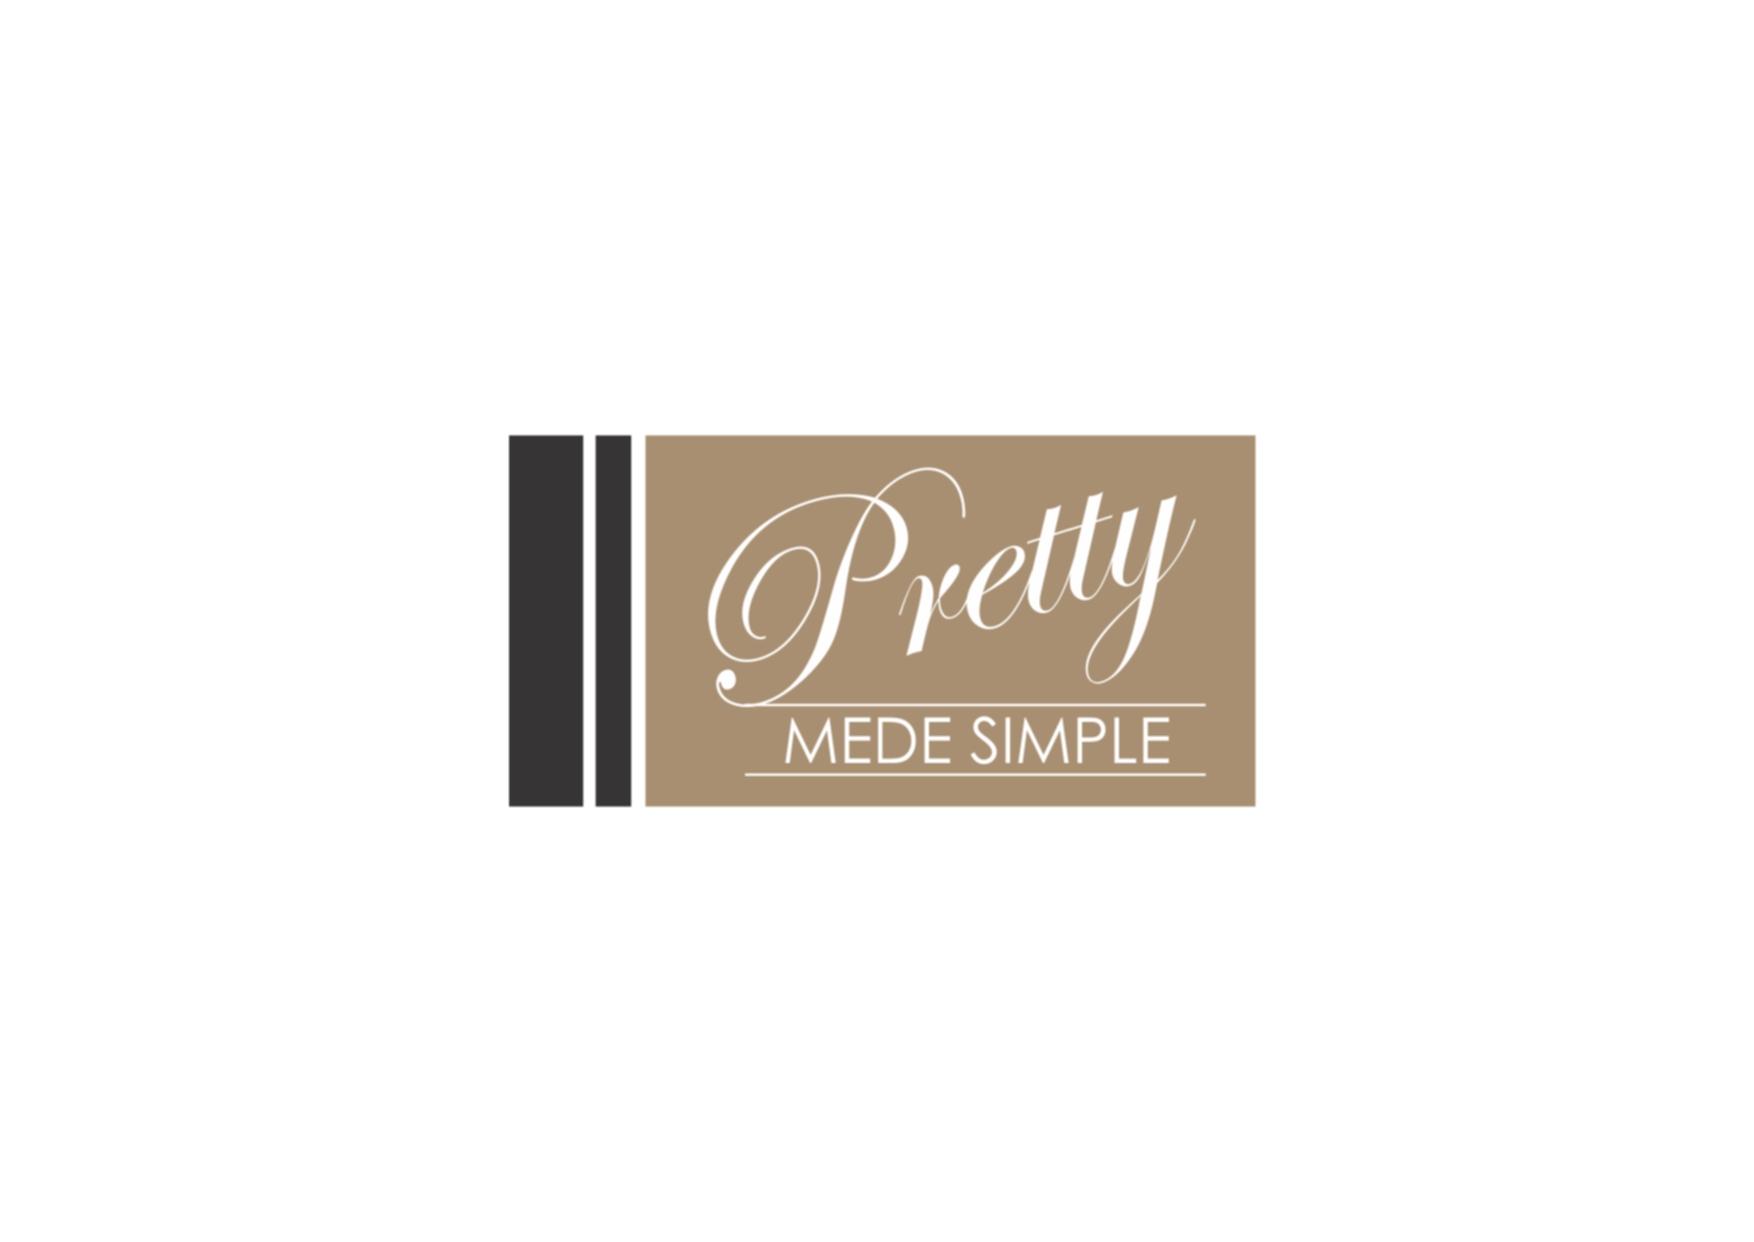 Logo Design by Private User - Entry No. 36 in the Logo Design Contest Pretty Made Simple Logo Design.